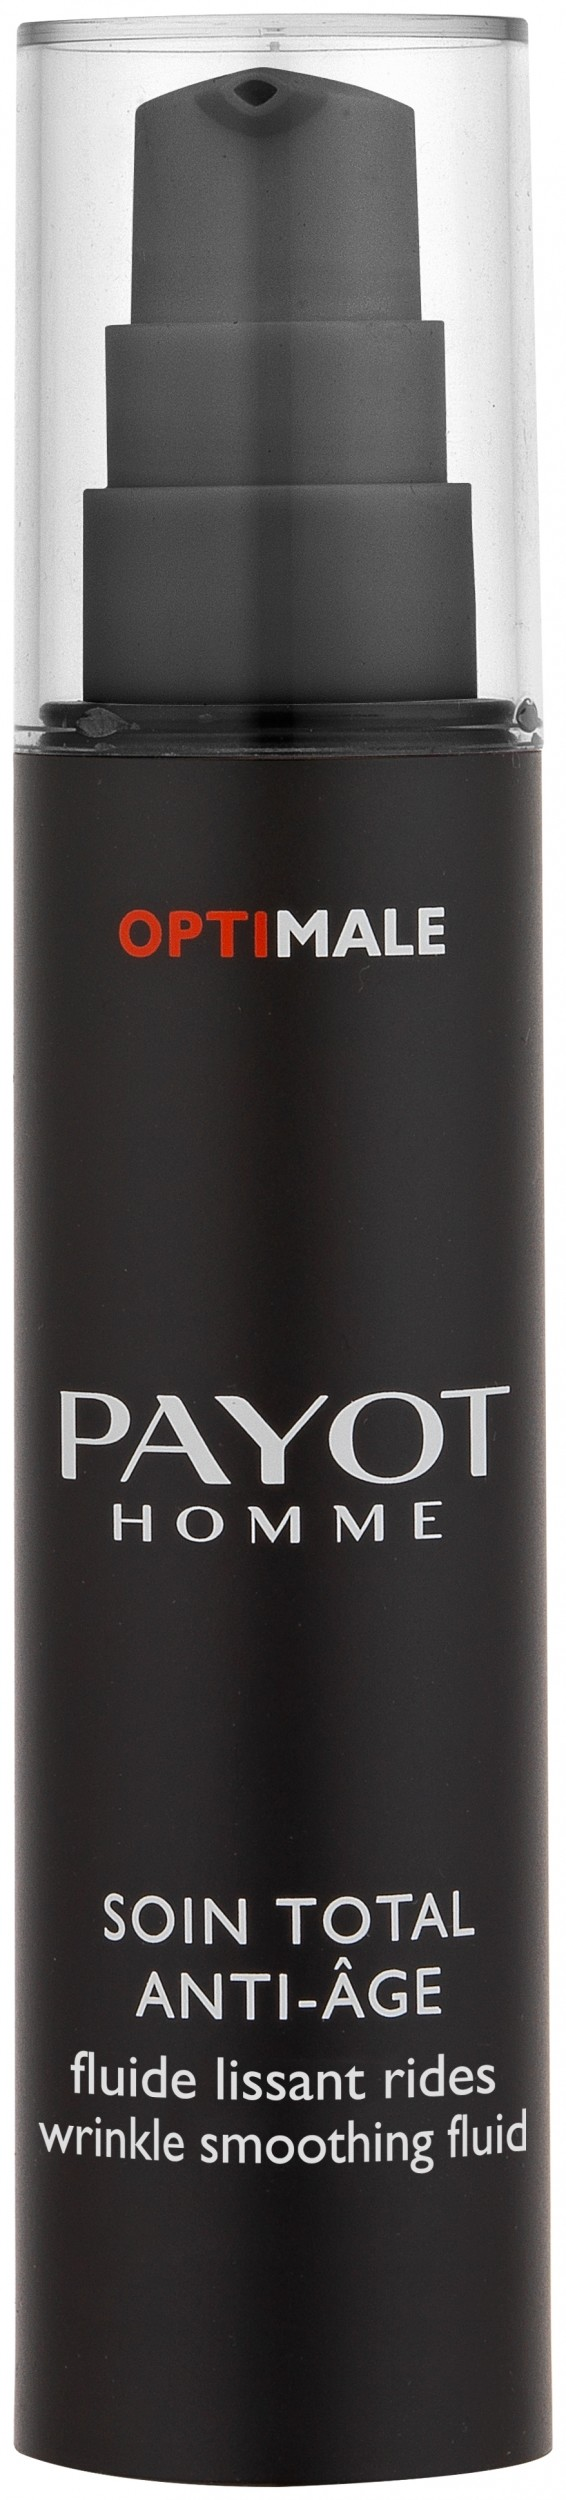 Флюид для мужчин для разглаживания морщин  Payot